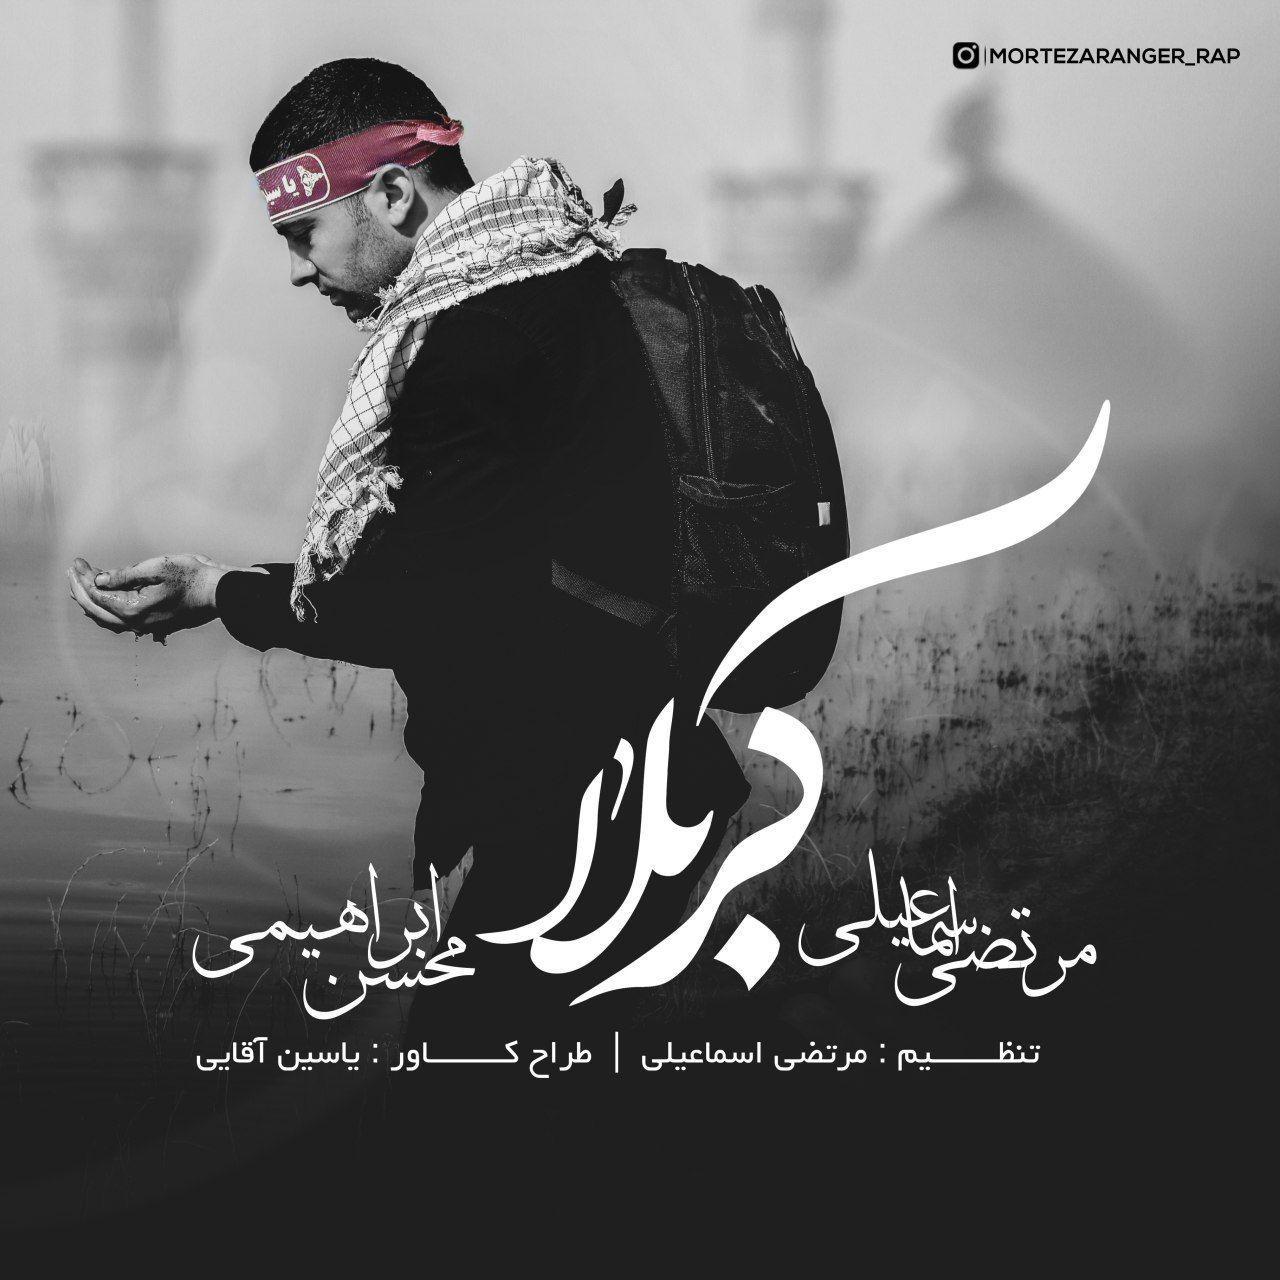 http://s5.picofile.com/file/8372196884/10Morteza_Esmaeili_Mohsen_Ebrahimi_Karbala.jpg